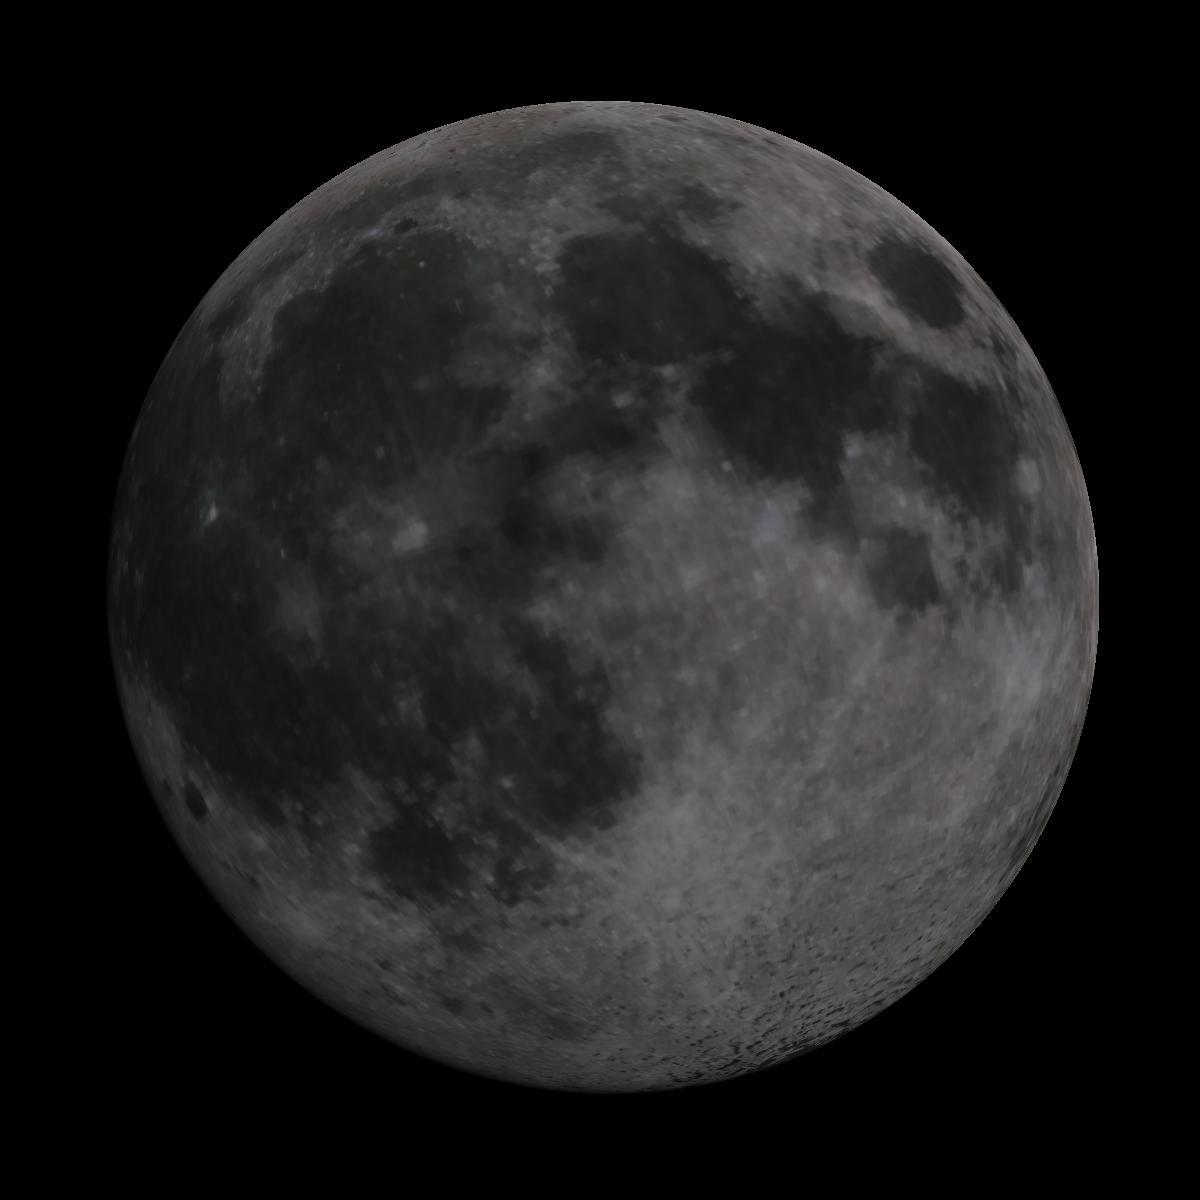 Lune du 9 mars 2020